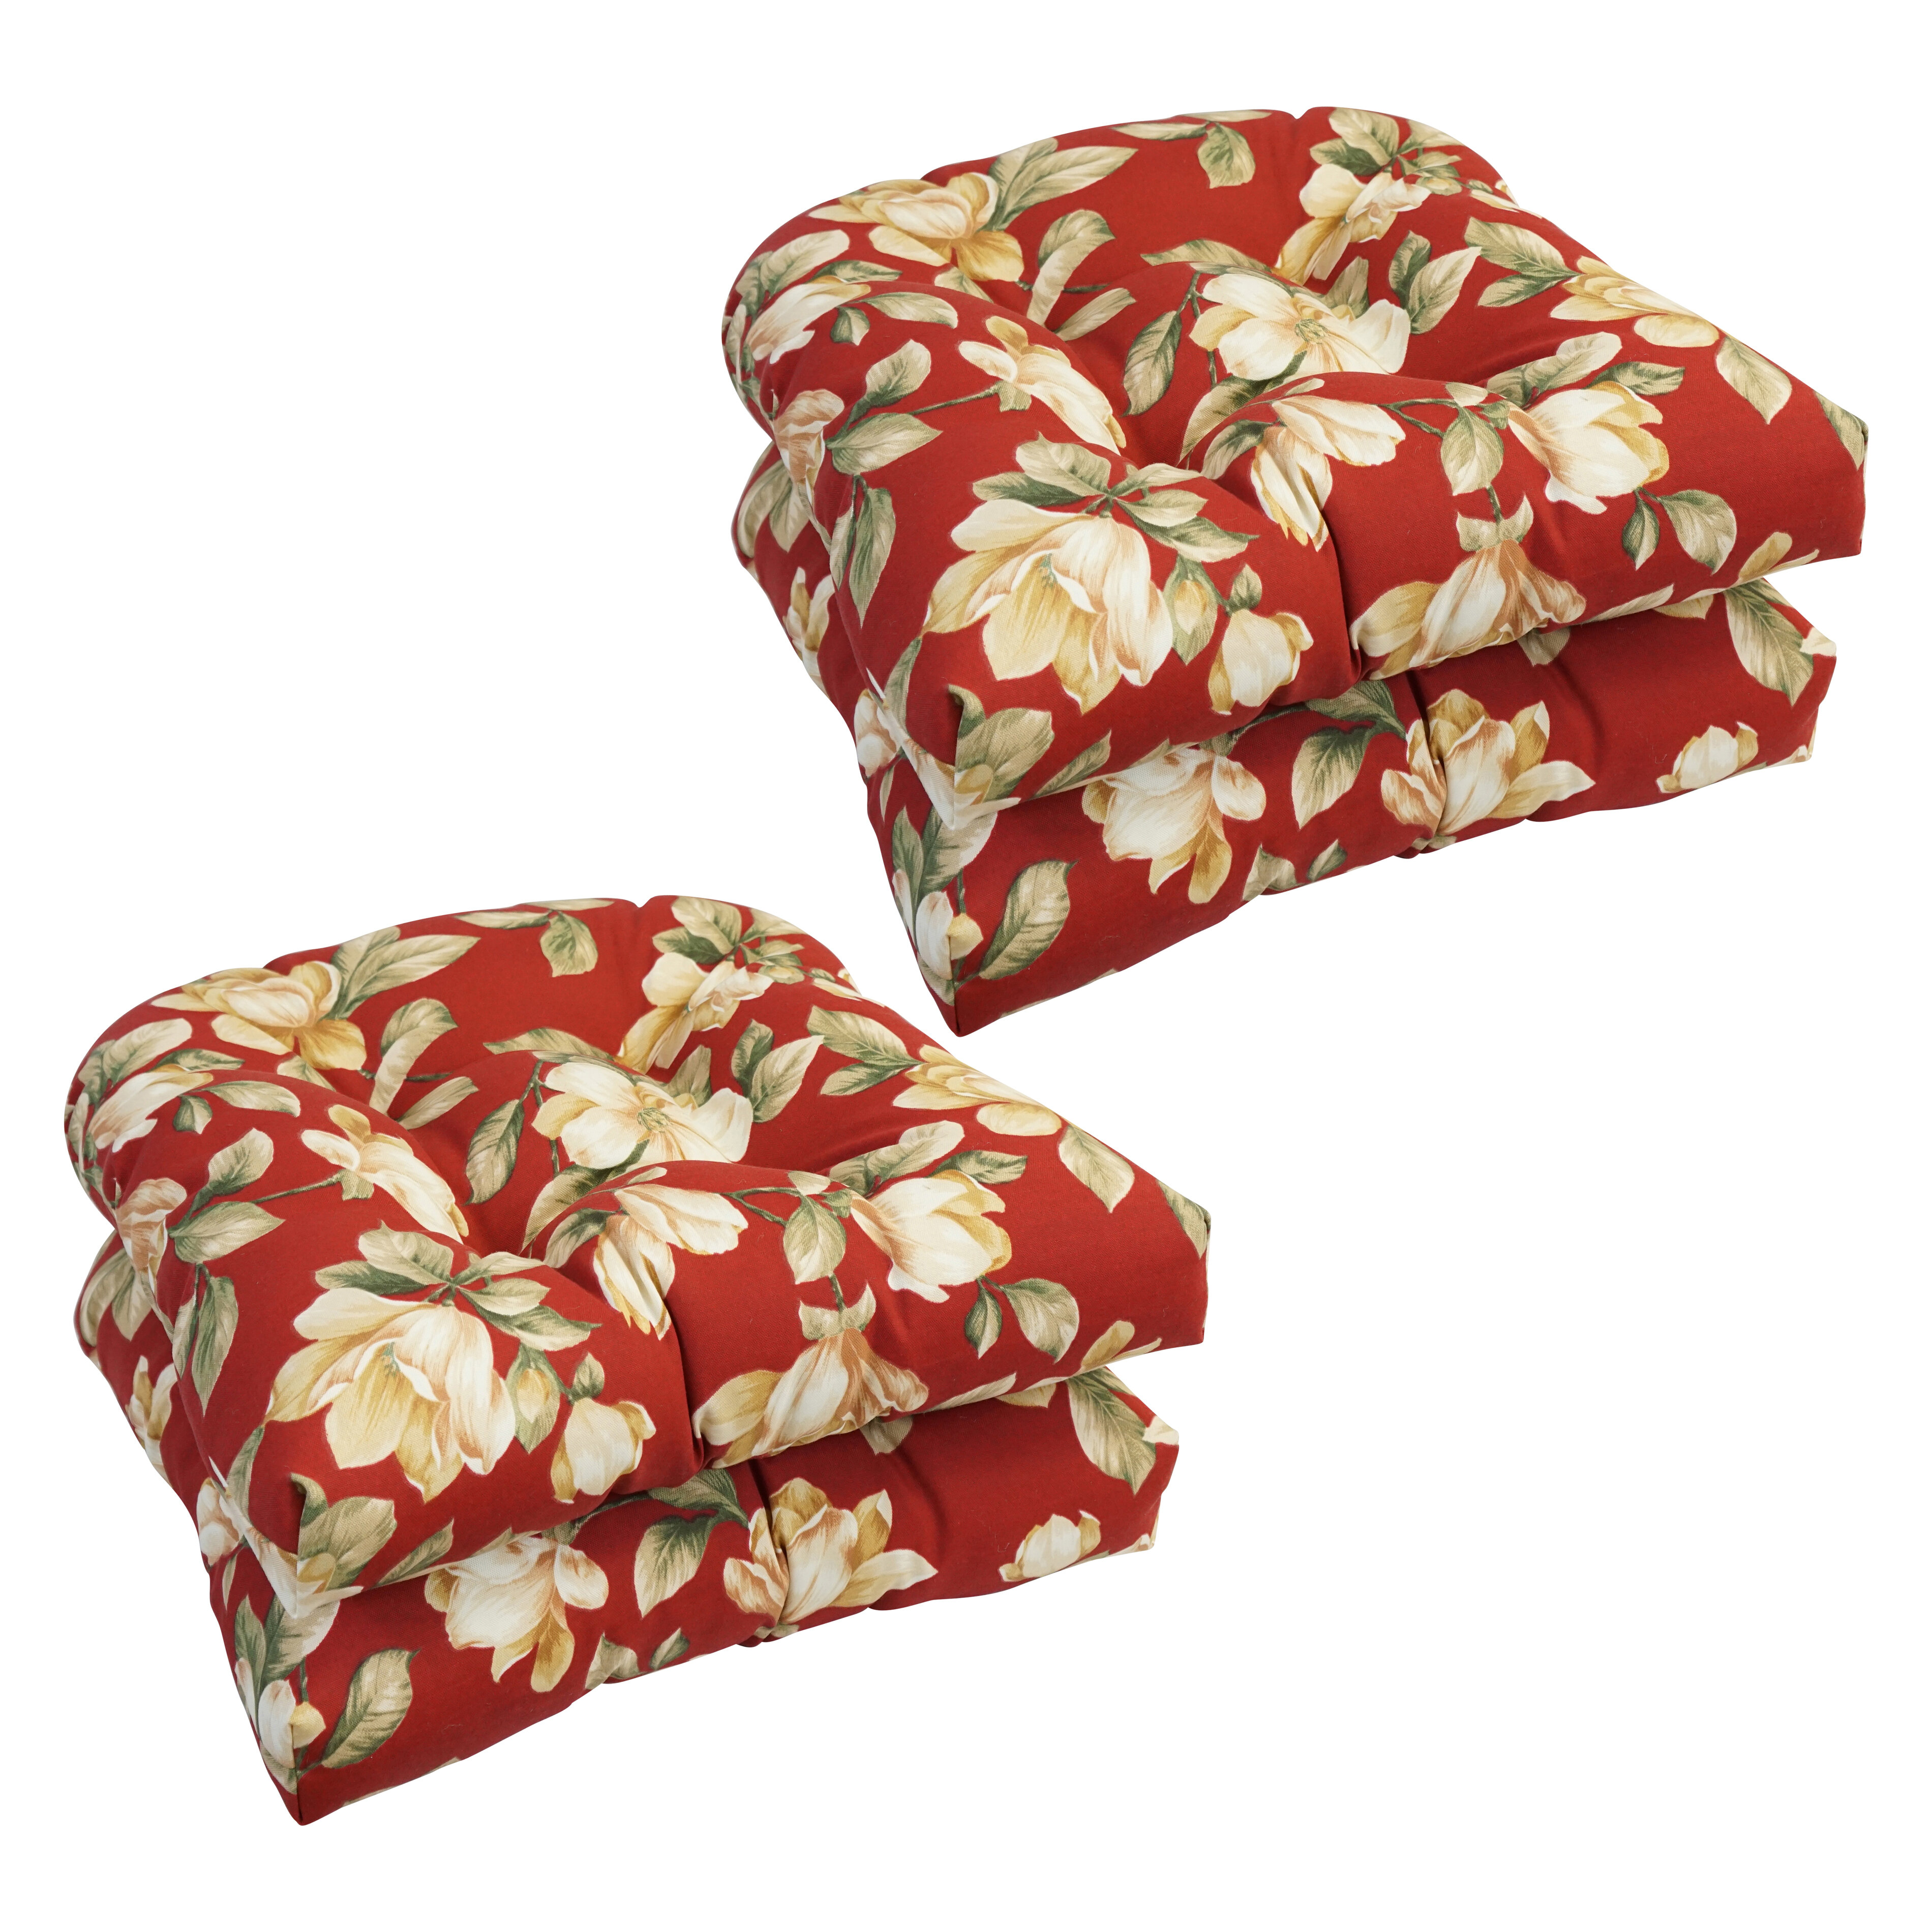 Red Barrel Studio Dining Chair Outdoor Seat Cushion Wayfair Ca